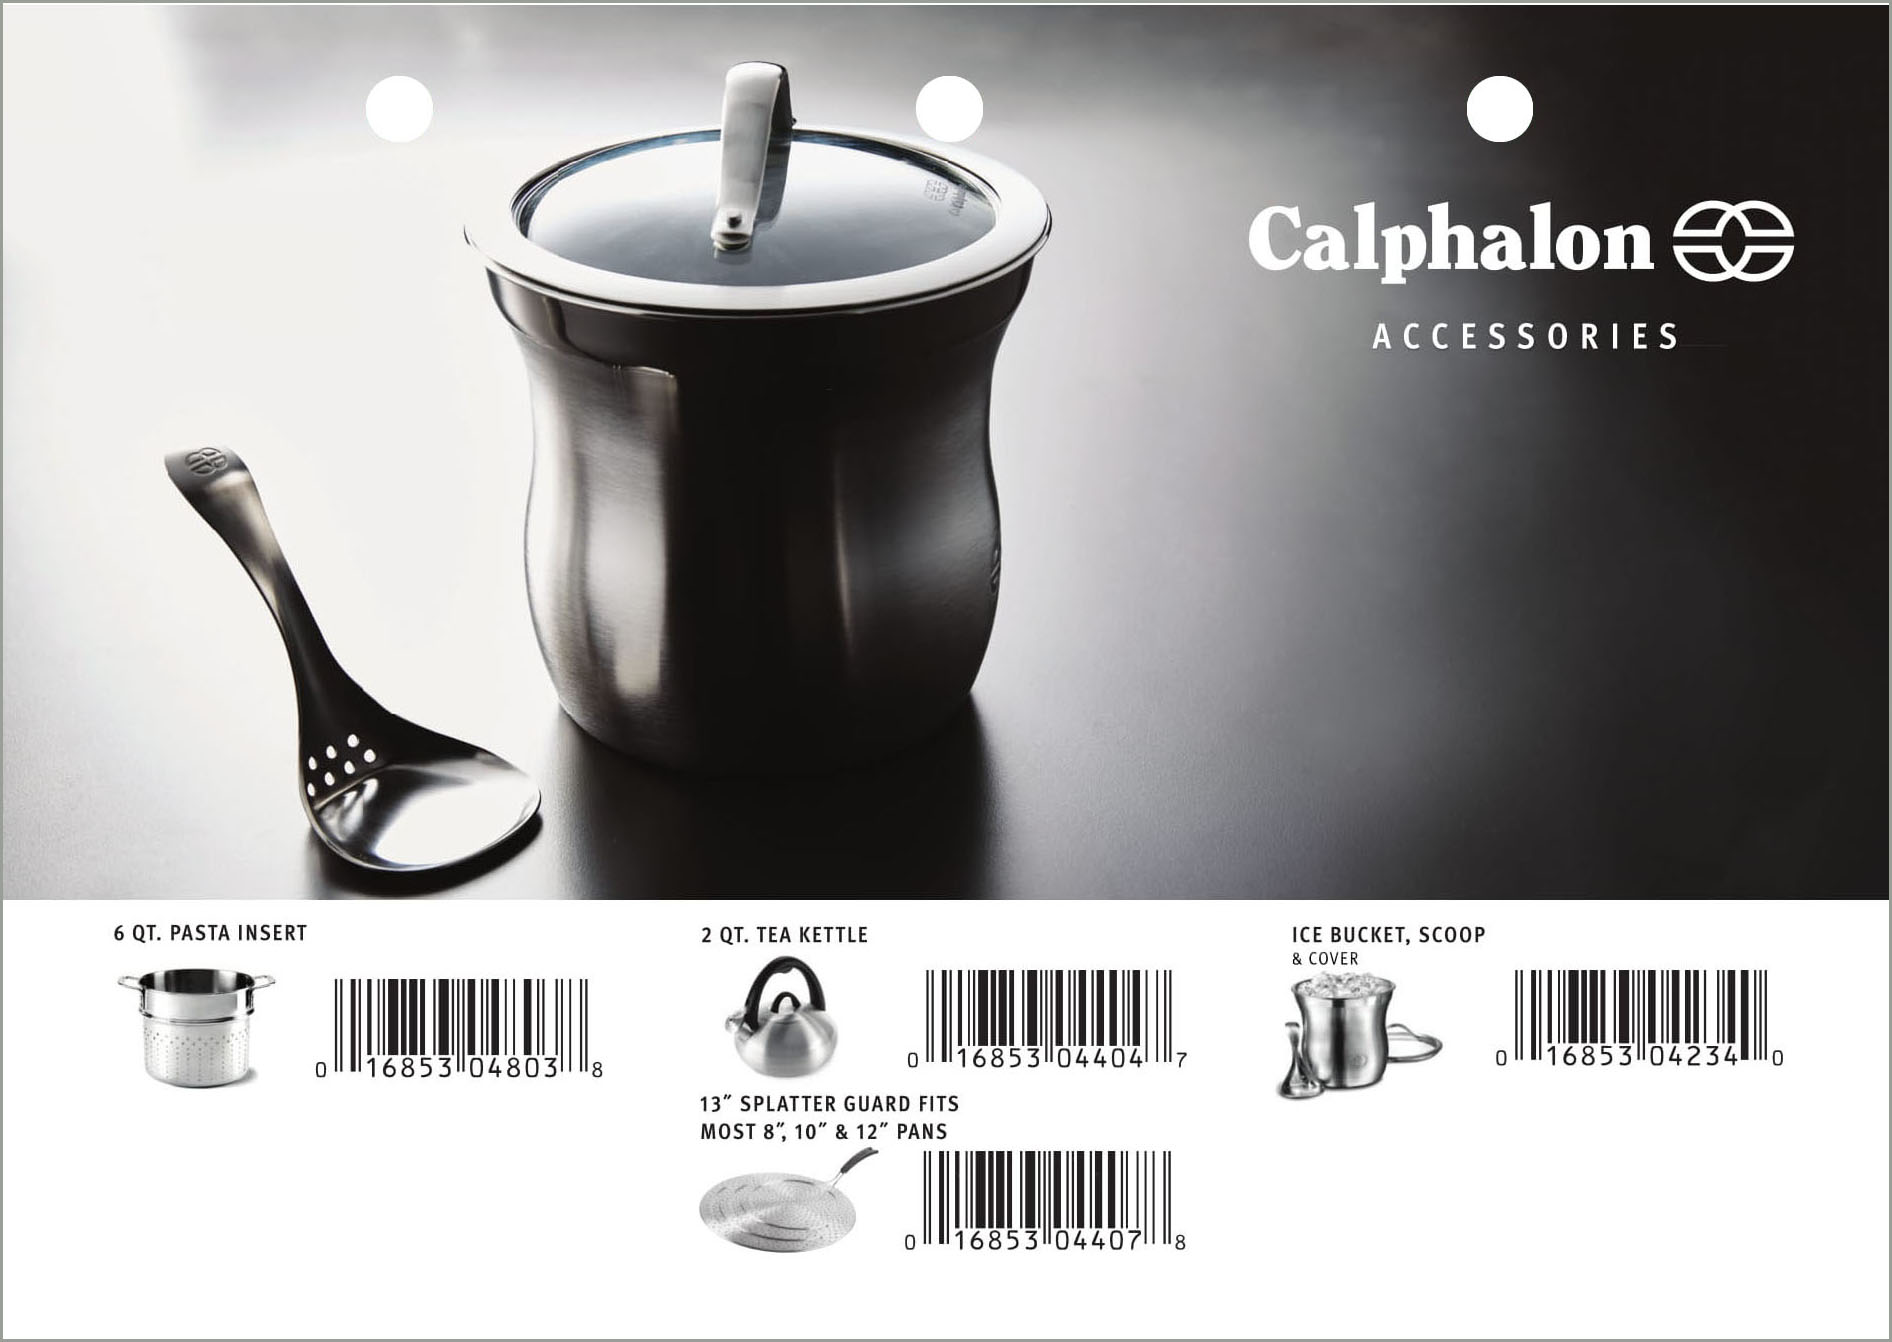 Calphalon_Flipbook_Pages_0000s_0014_75783_Calphalon_Macys_FlipBook_R6_M_0002_75783_Calphalon_Macys_FlipBook_R6_M_PDFX1A-.jpg